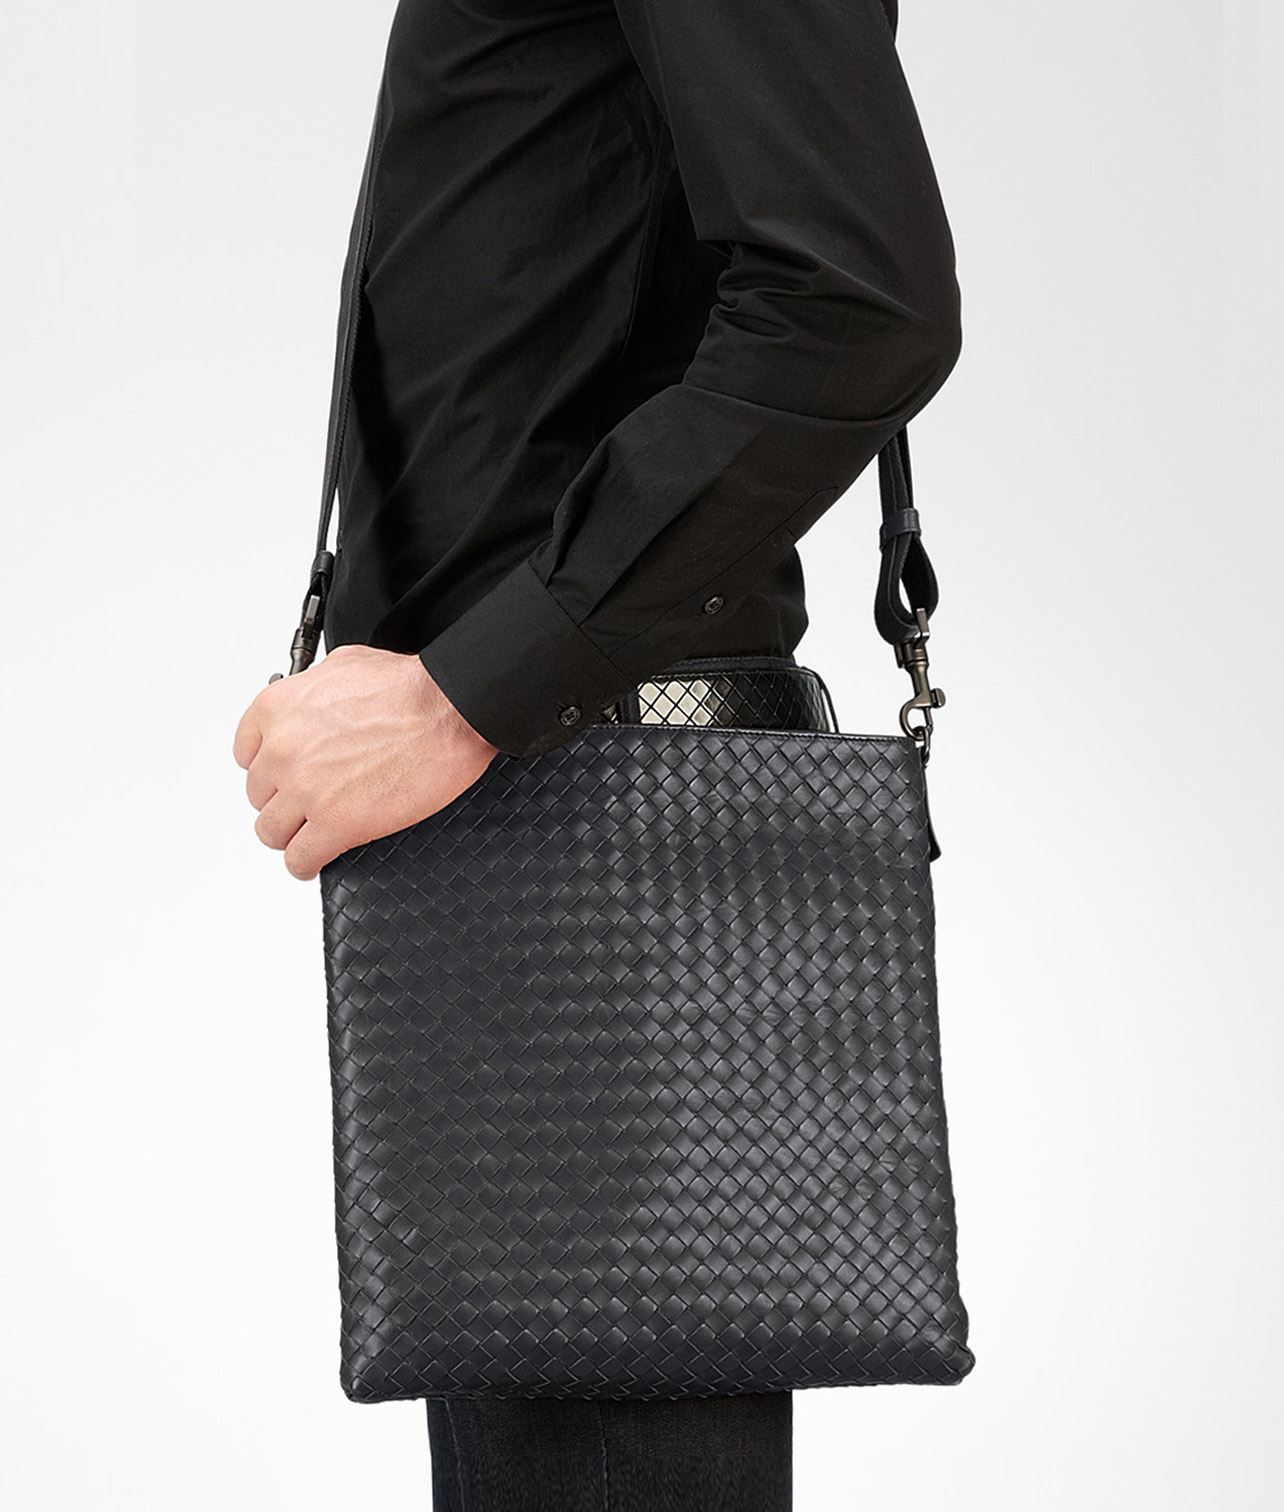 replica chloe classic 1836 handbag lambskin beige